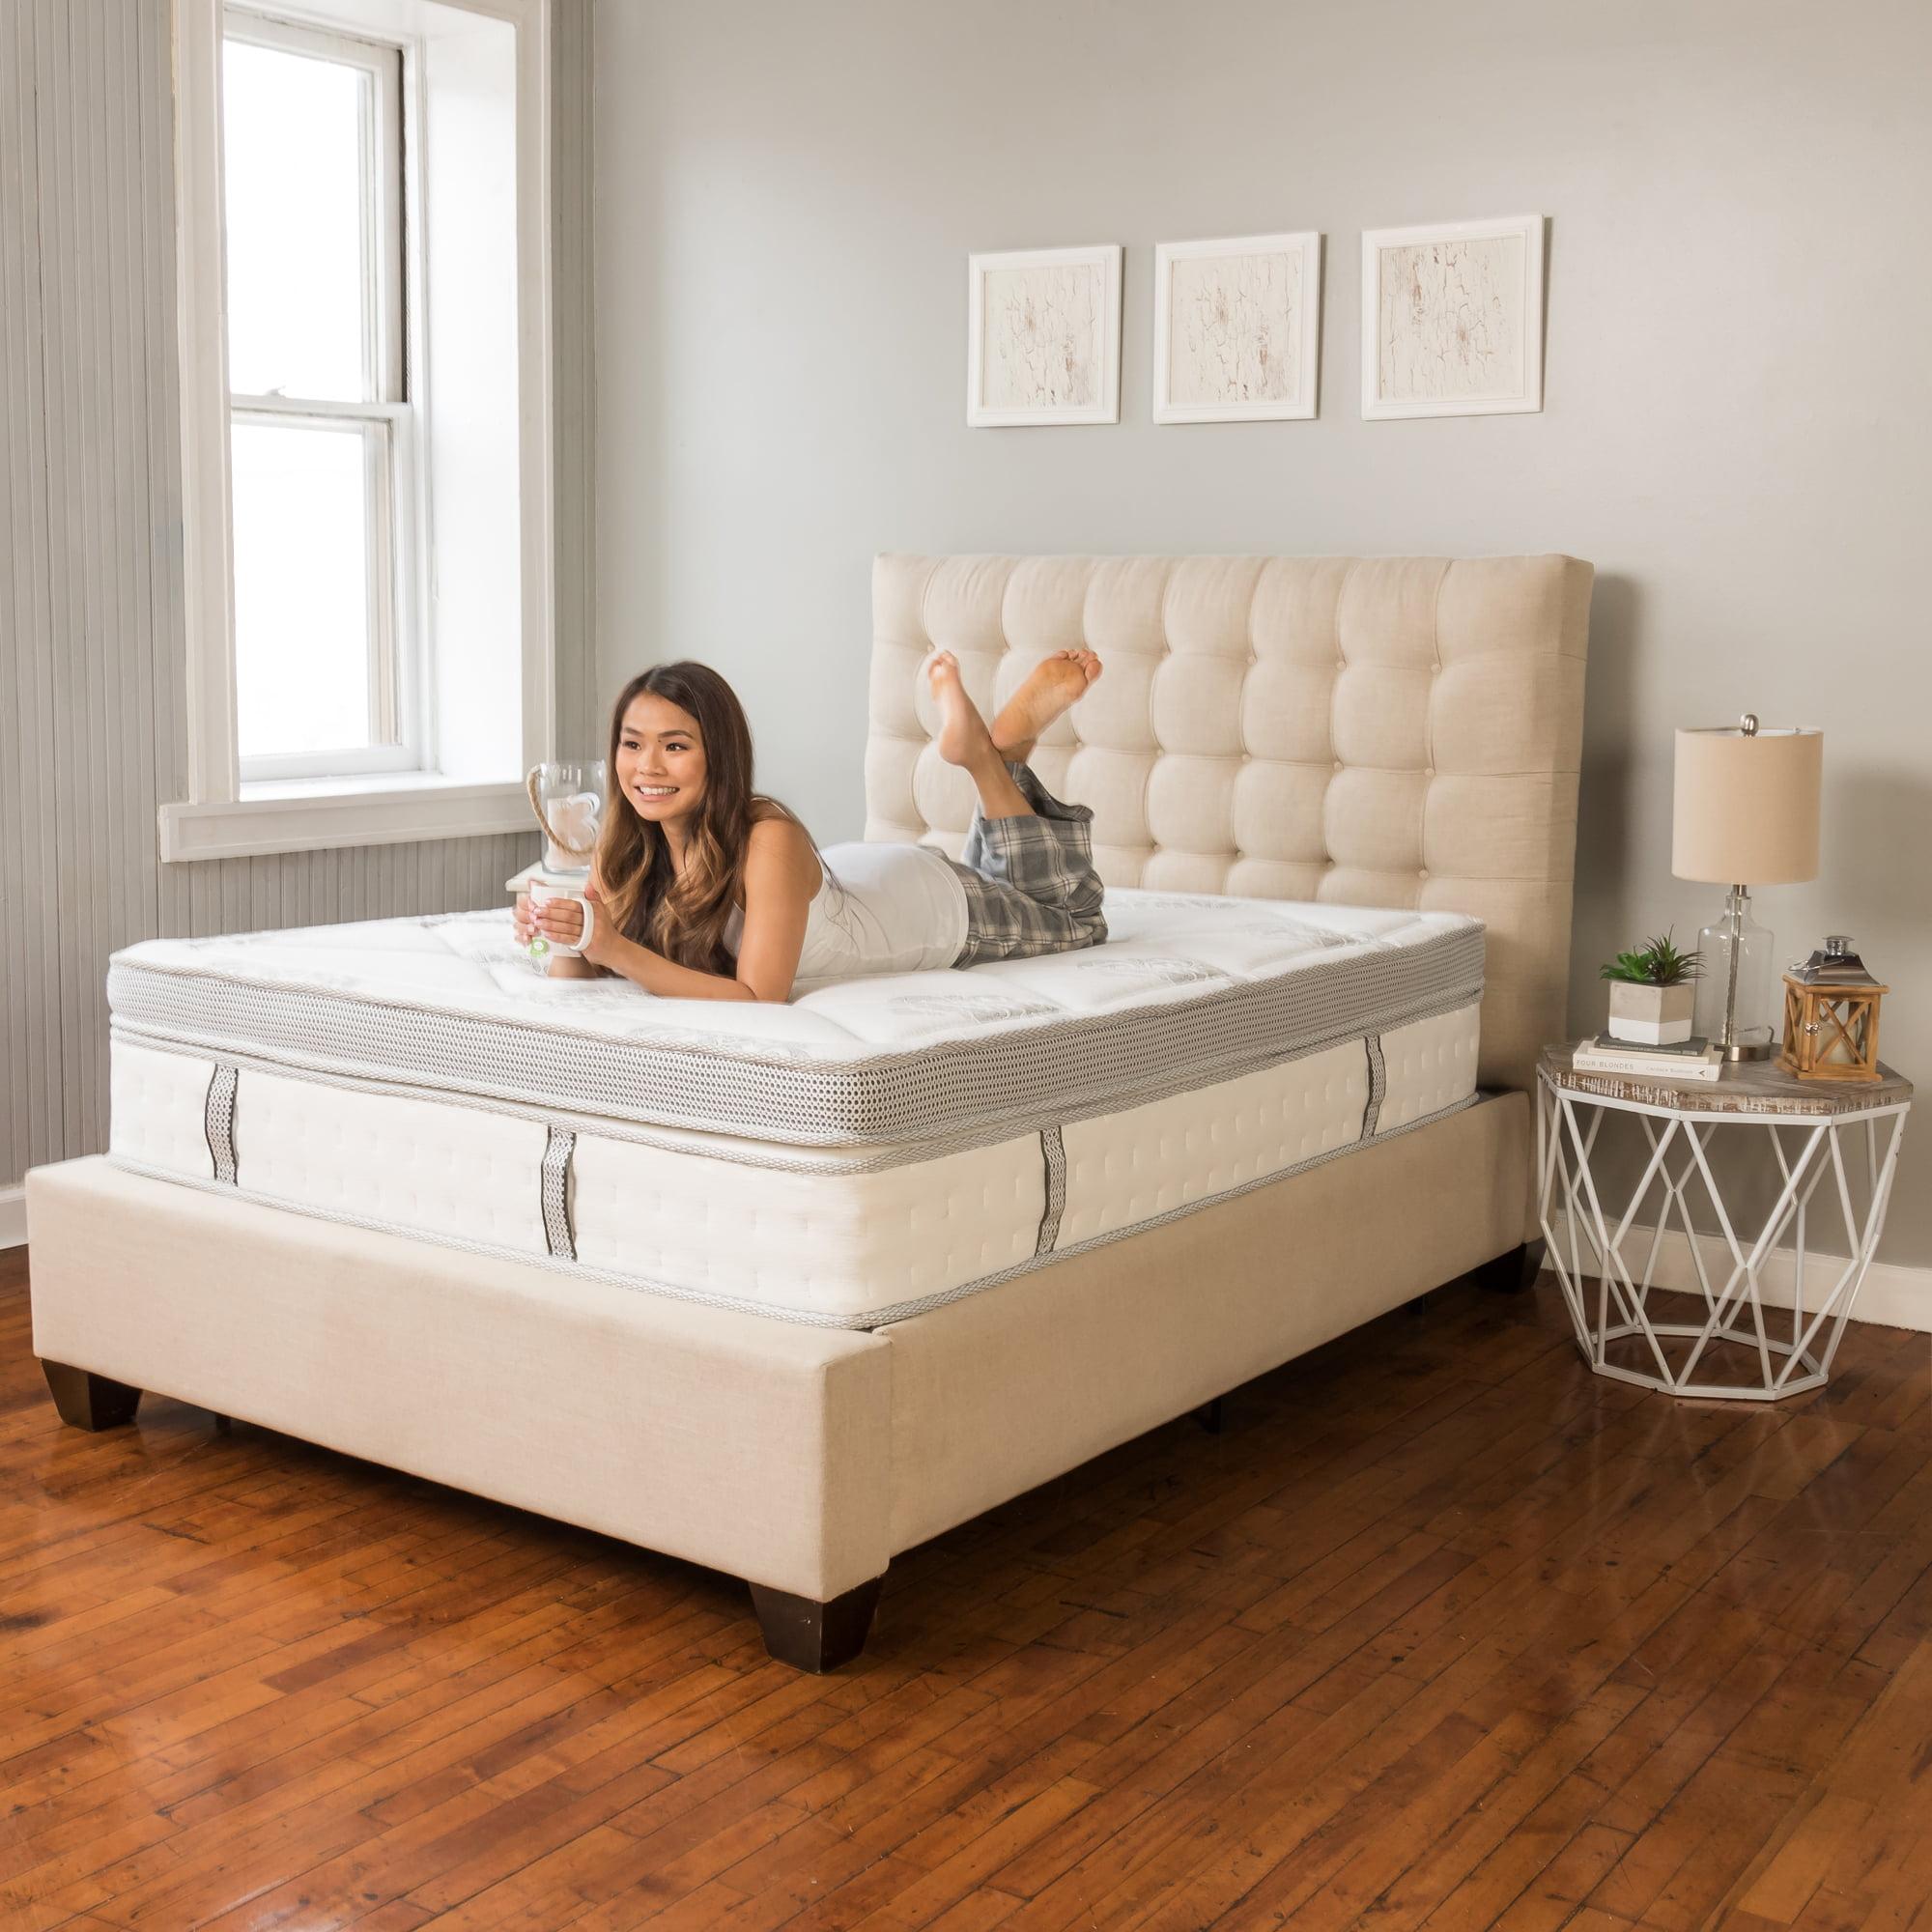 "Modern Sleep Pillow Top 14"" Hybrid Cool Gel Memory Foam and Innerspring Mattress by Classic Brands"